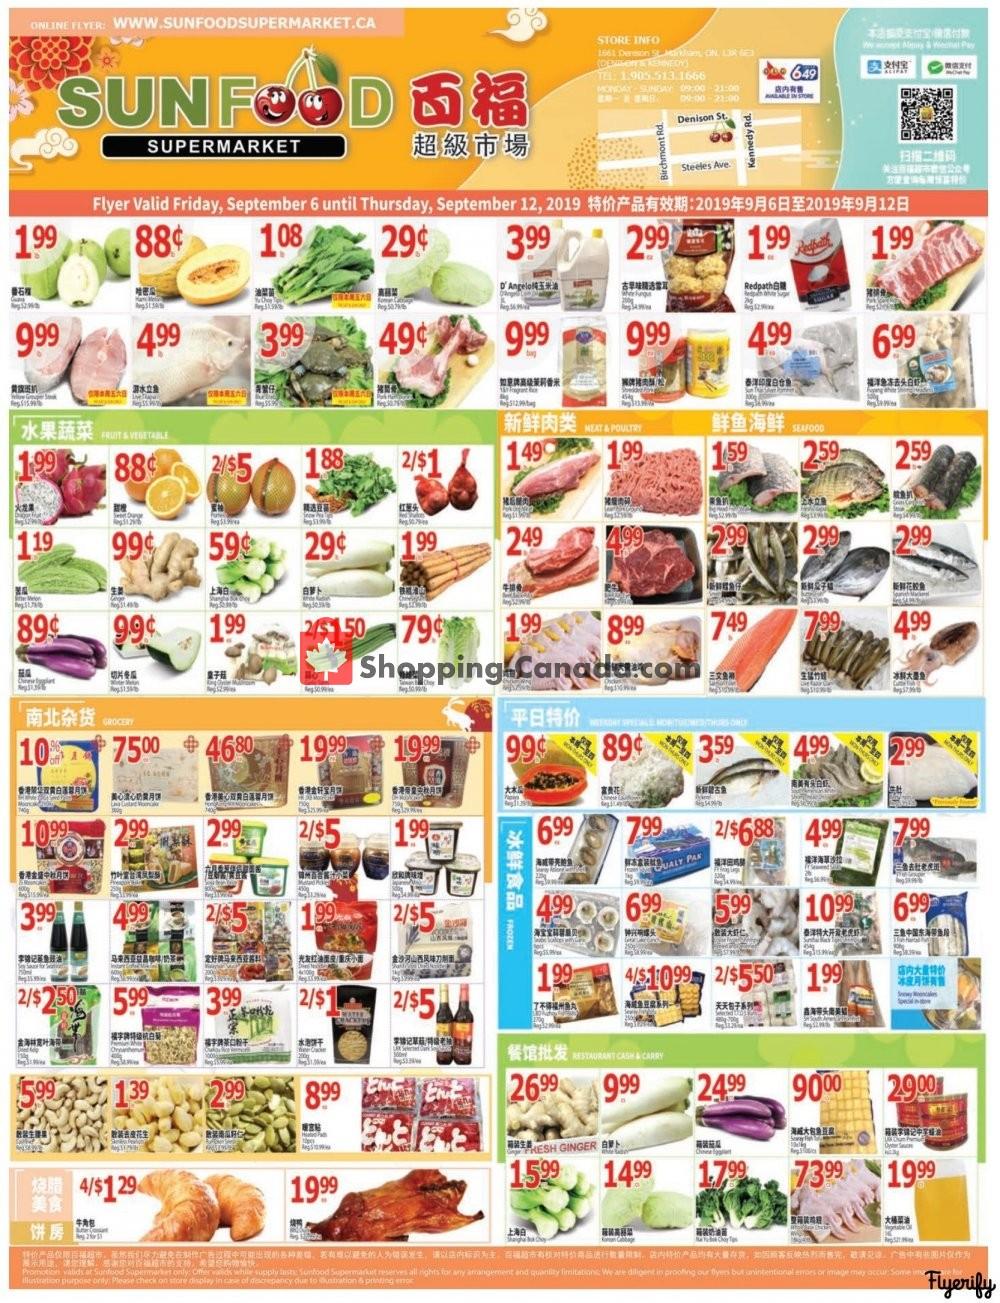 Flyer Sunfood Supermarket Canada - from Friday September 6, 2019 to Thursday September 12, 2019